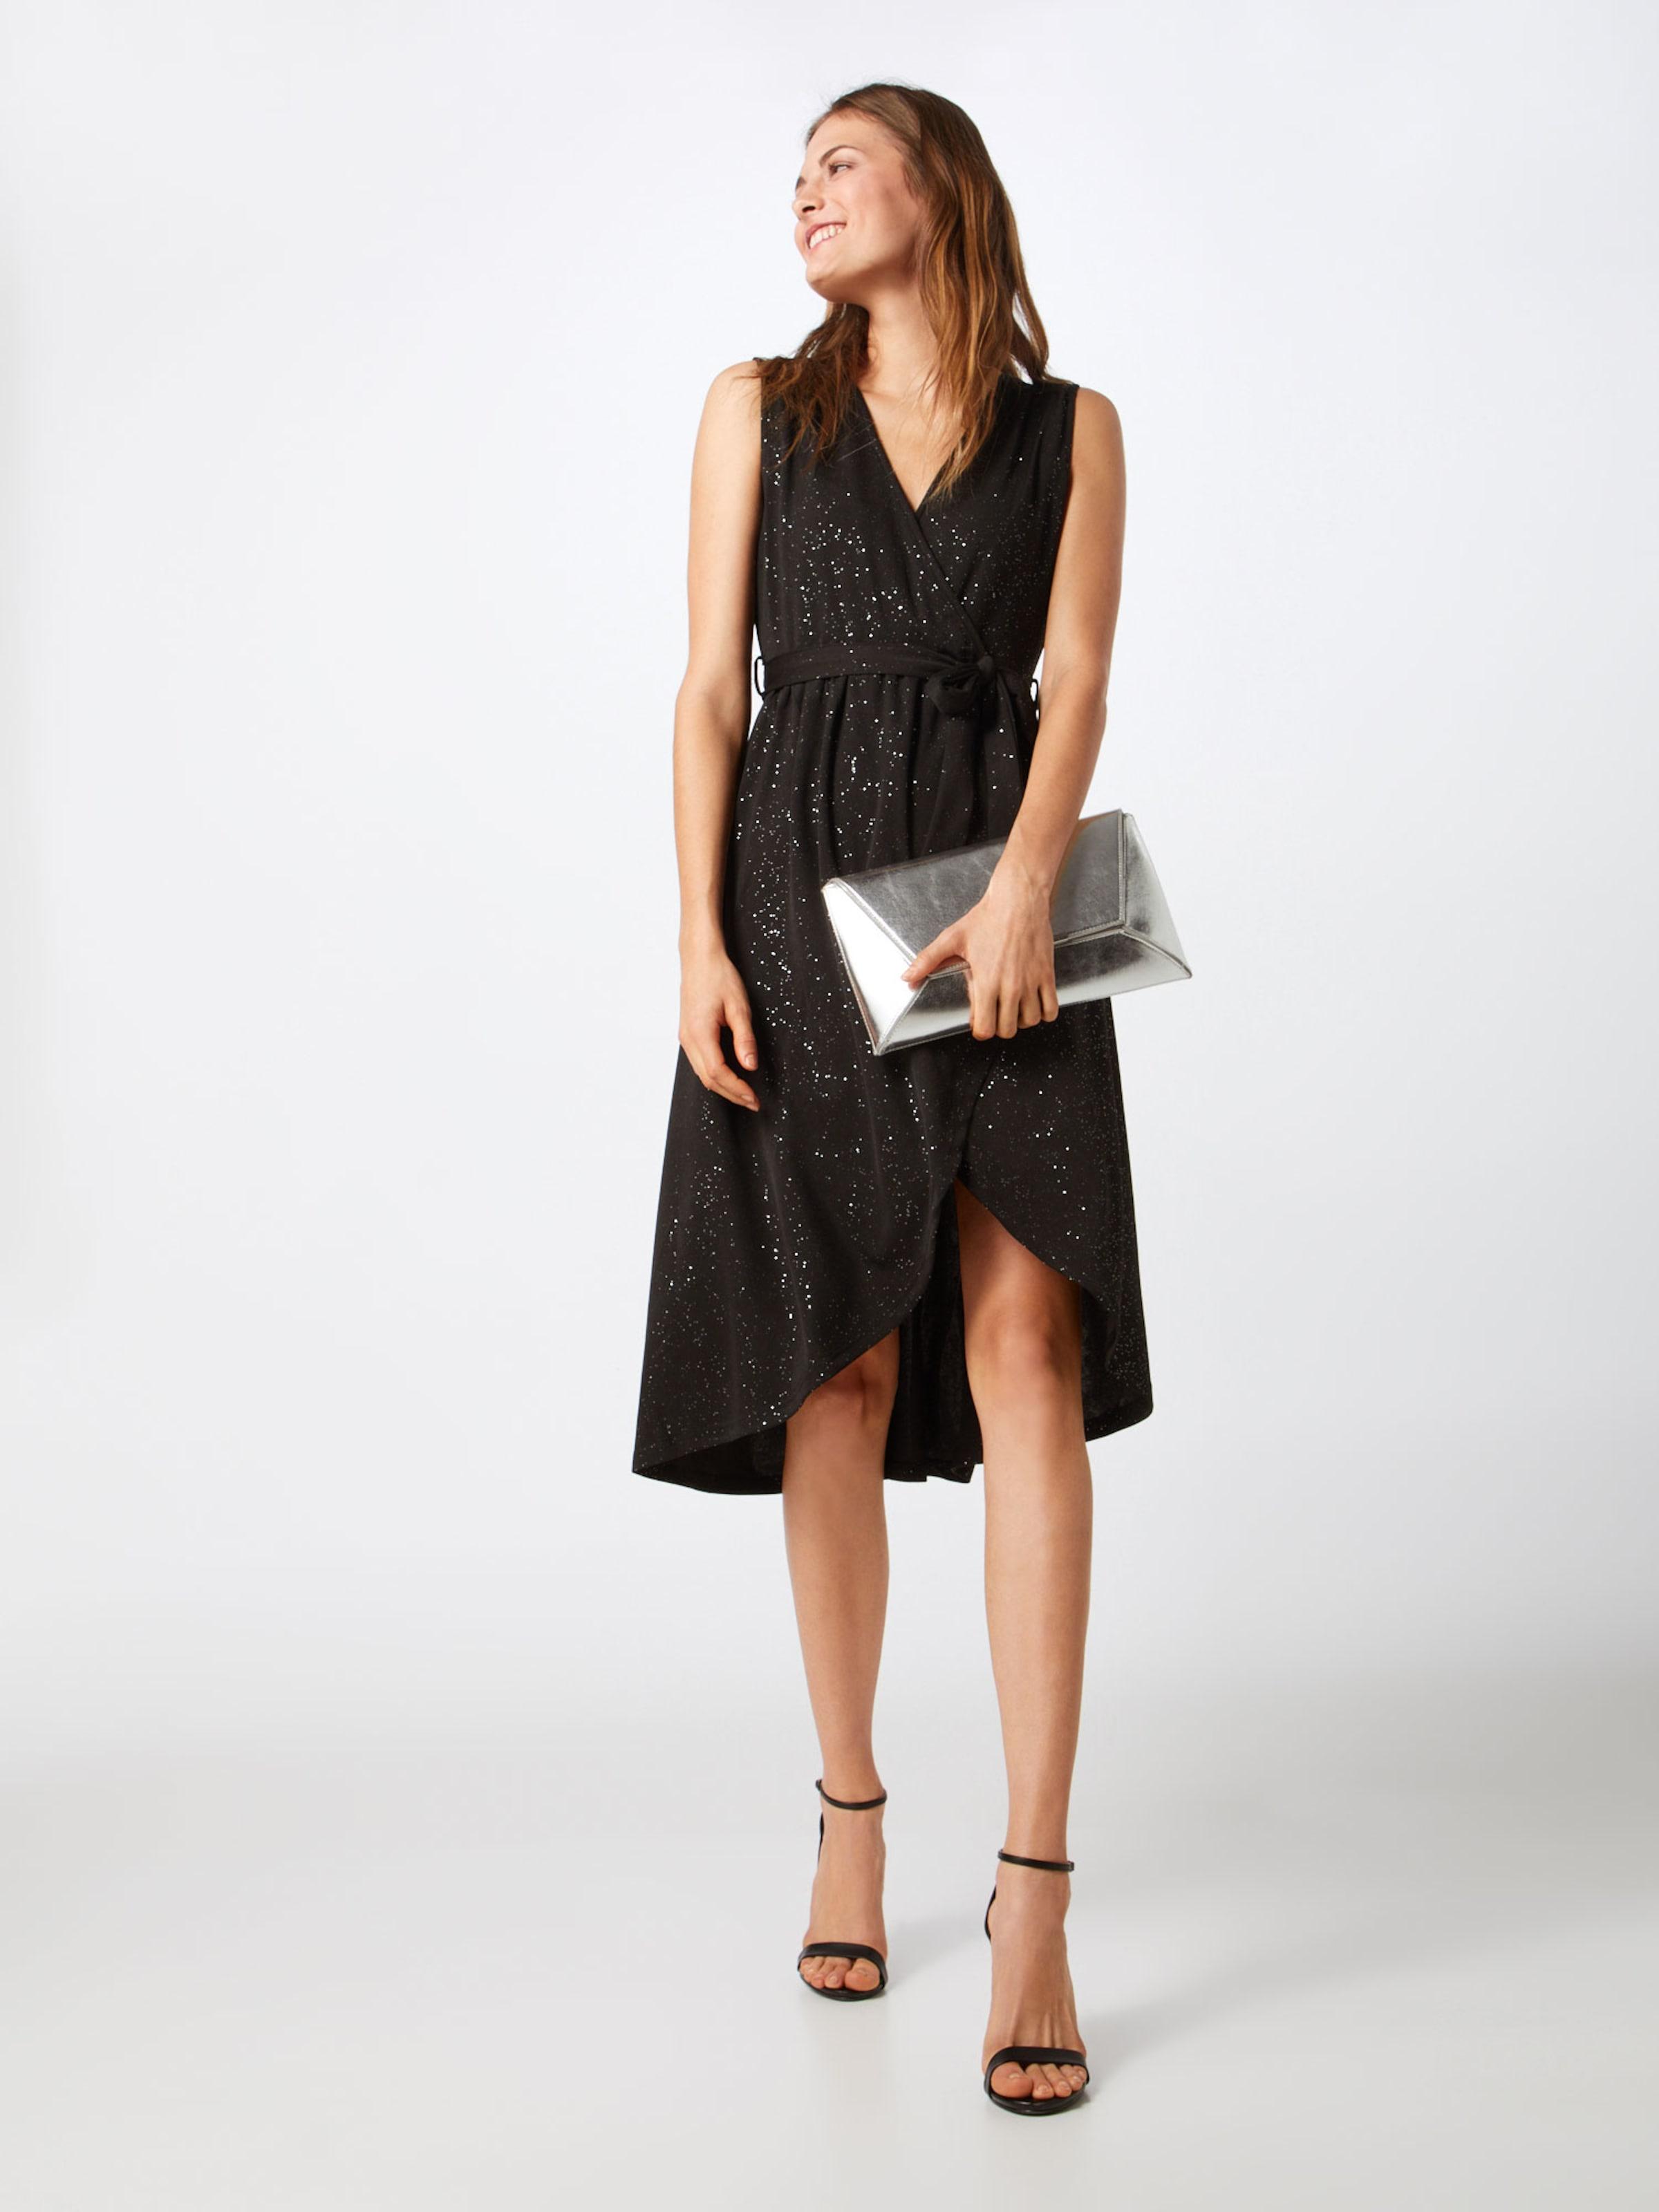 'glitz Dress' DamenKleider London Mela SchwarzSilber Midi In 6bvgY7yf